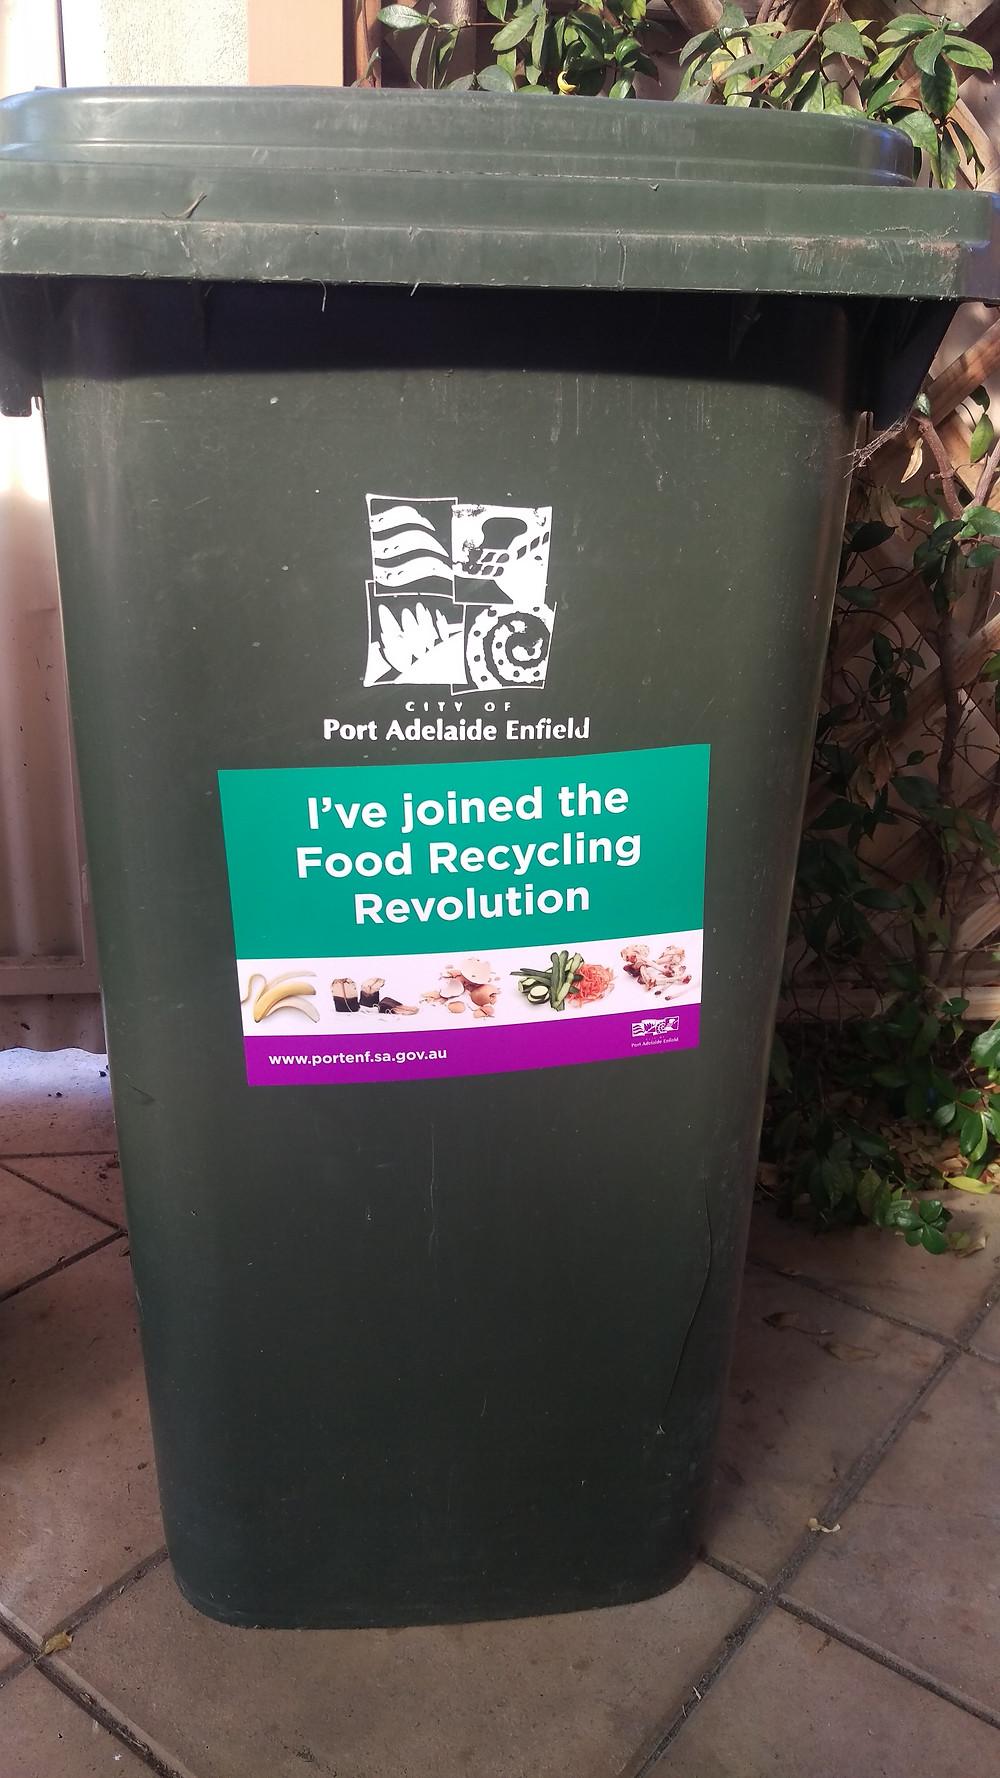 Port Adelaide Enfield Green Bin Food Recycling Revolution